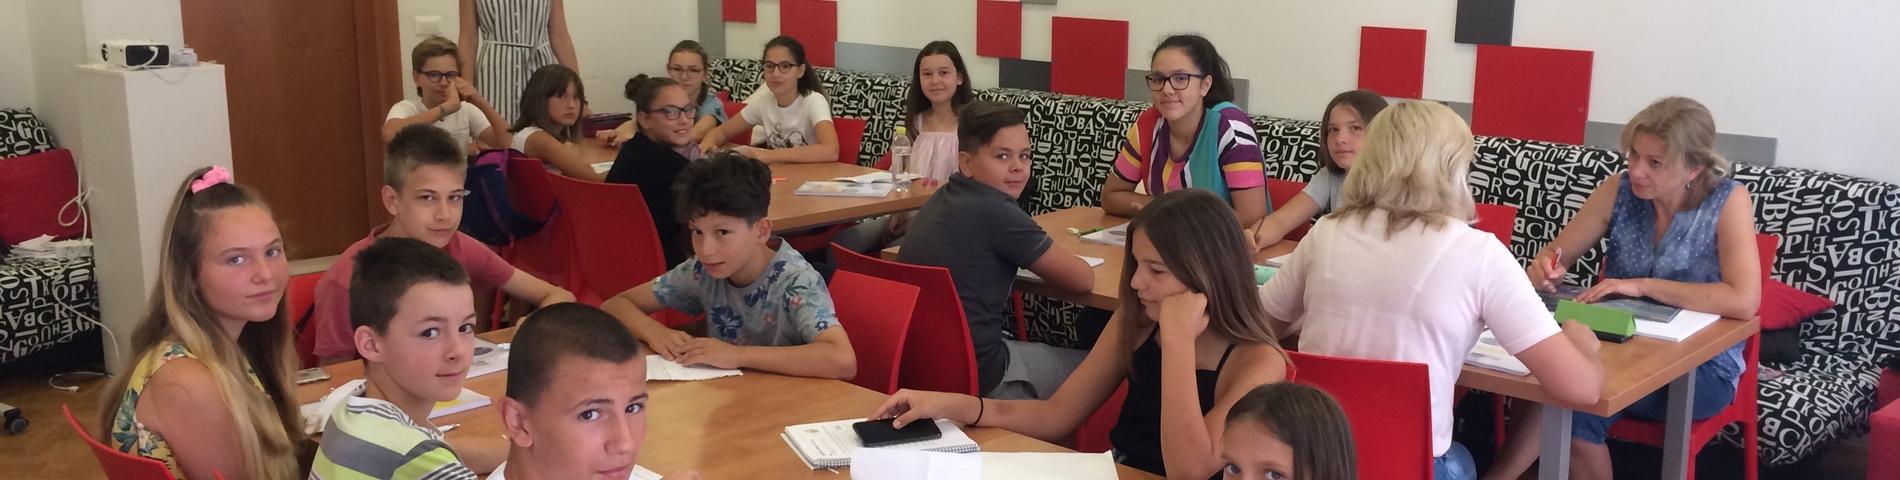 Dubrovnik Language School snímek 1